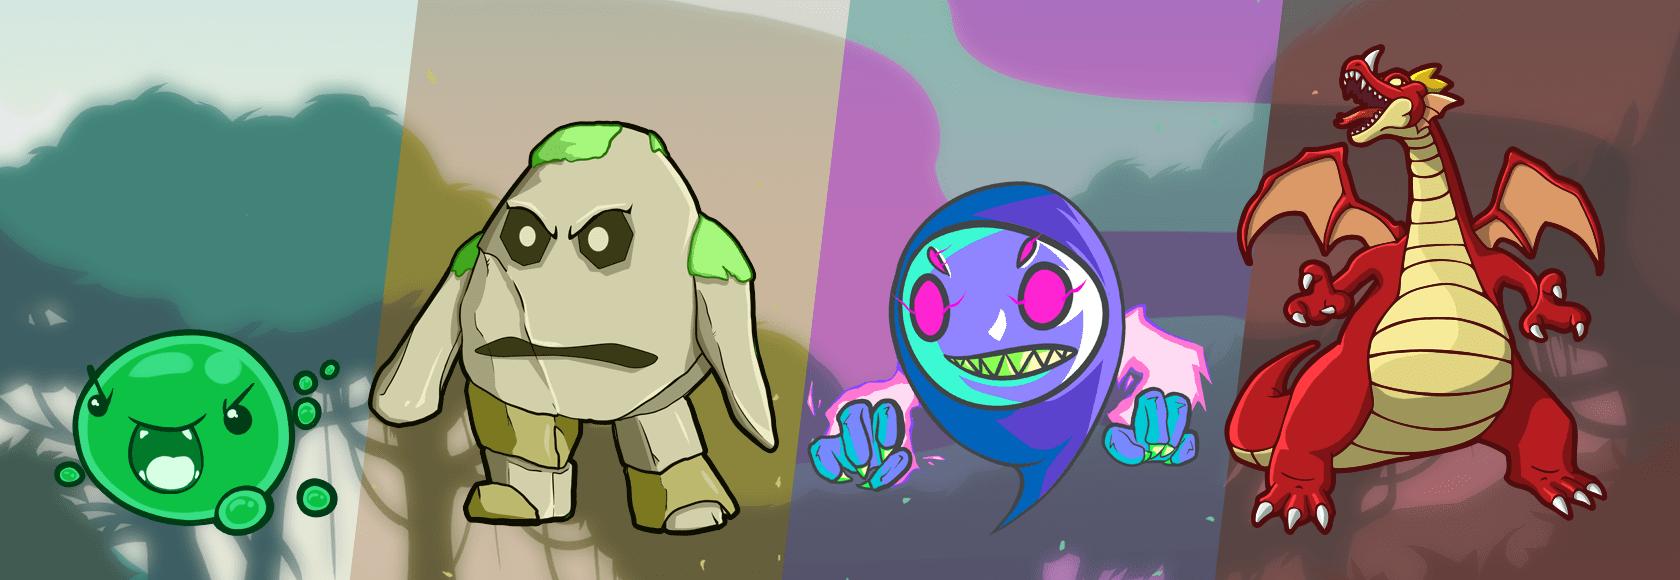 Monsters of the Debt Enemy Art